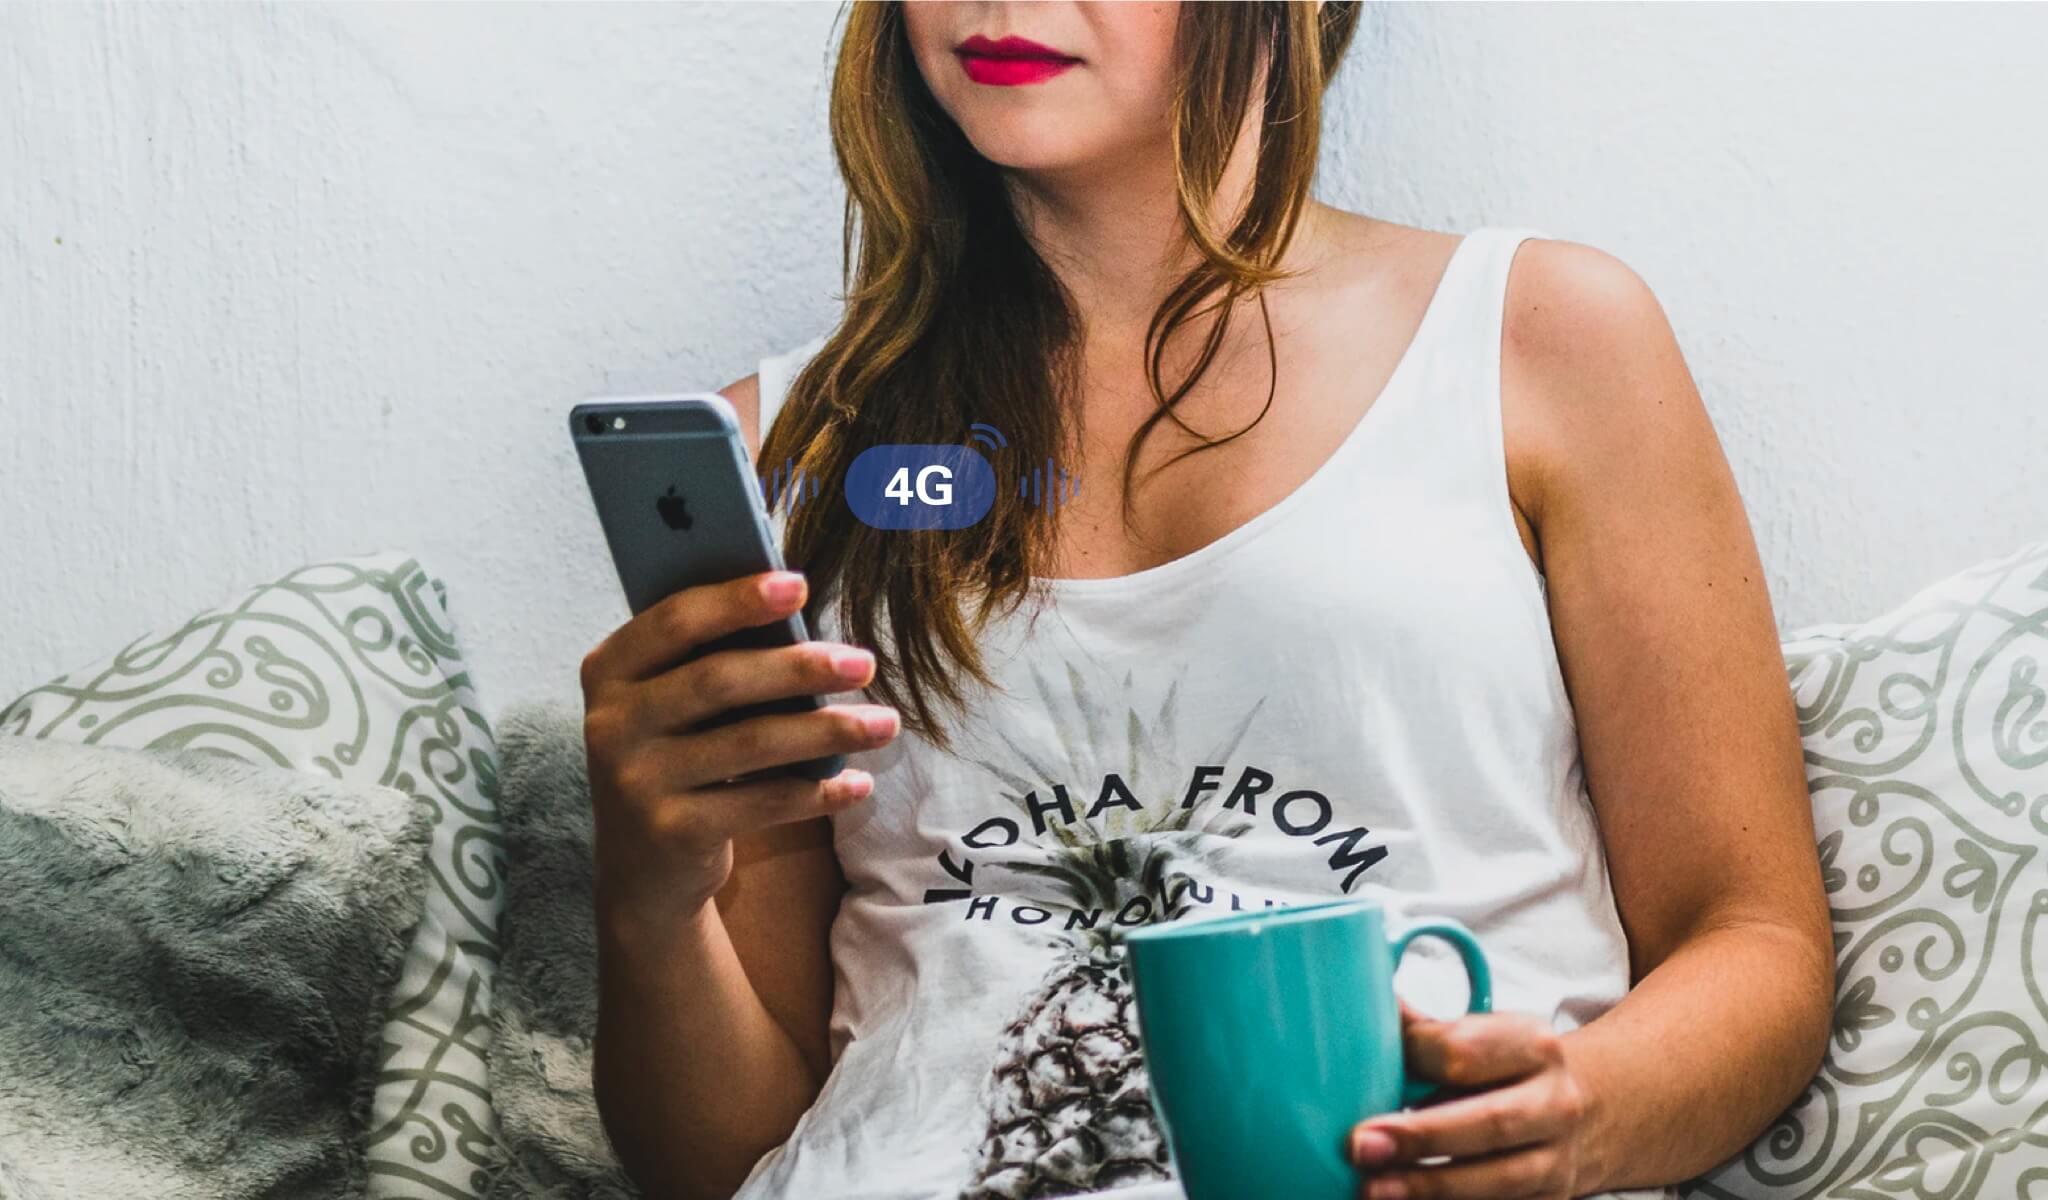 Tuya 4G LTE Solutions